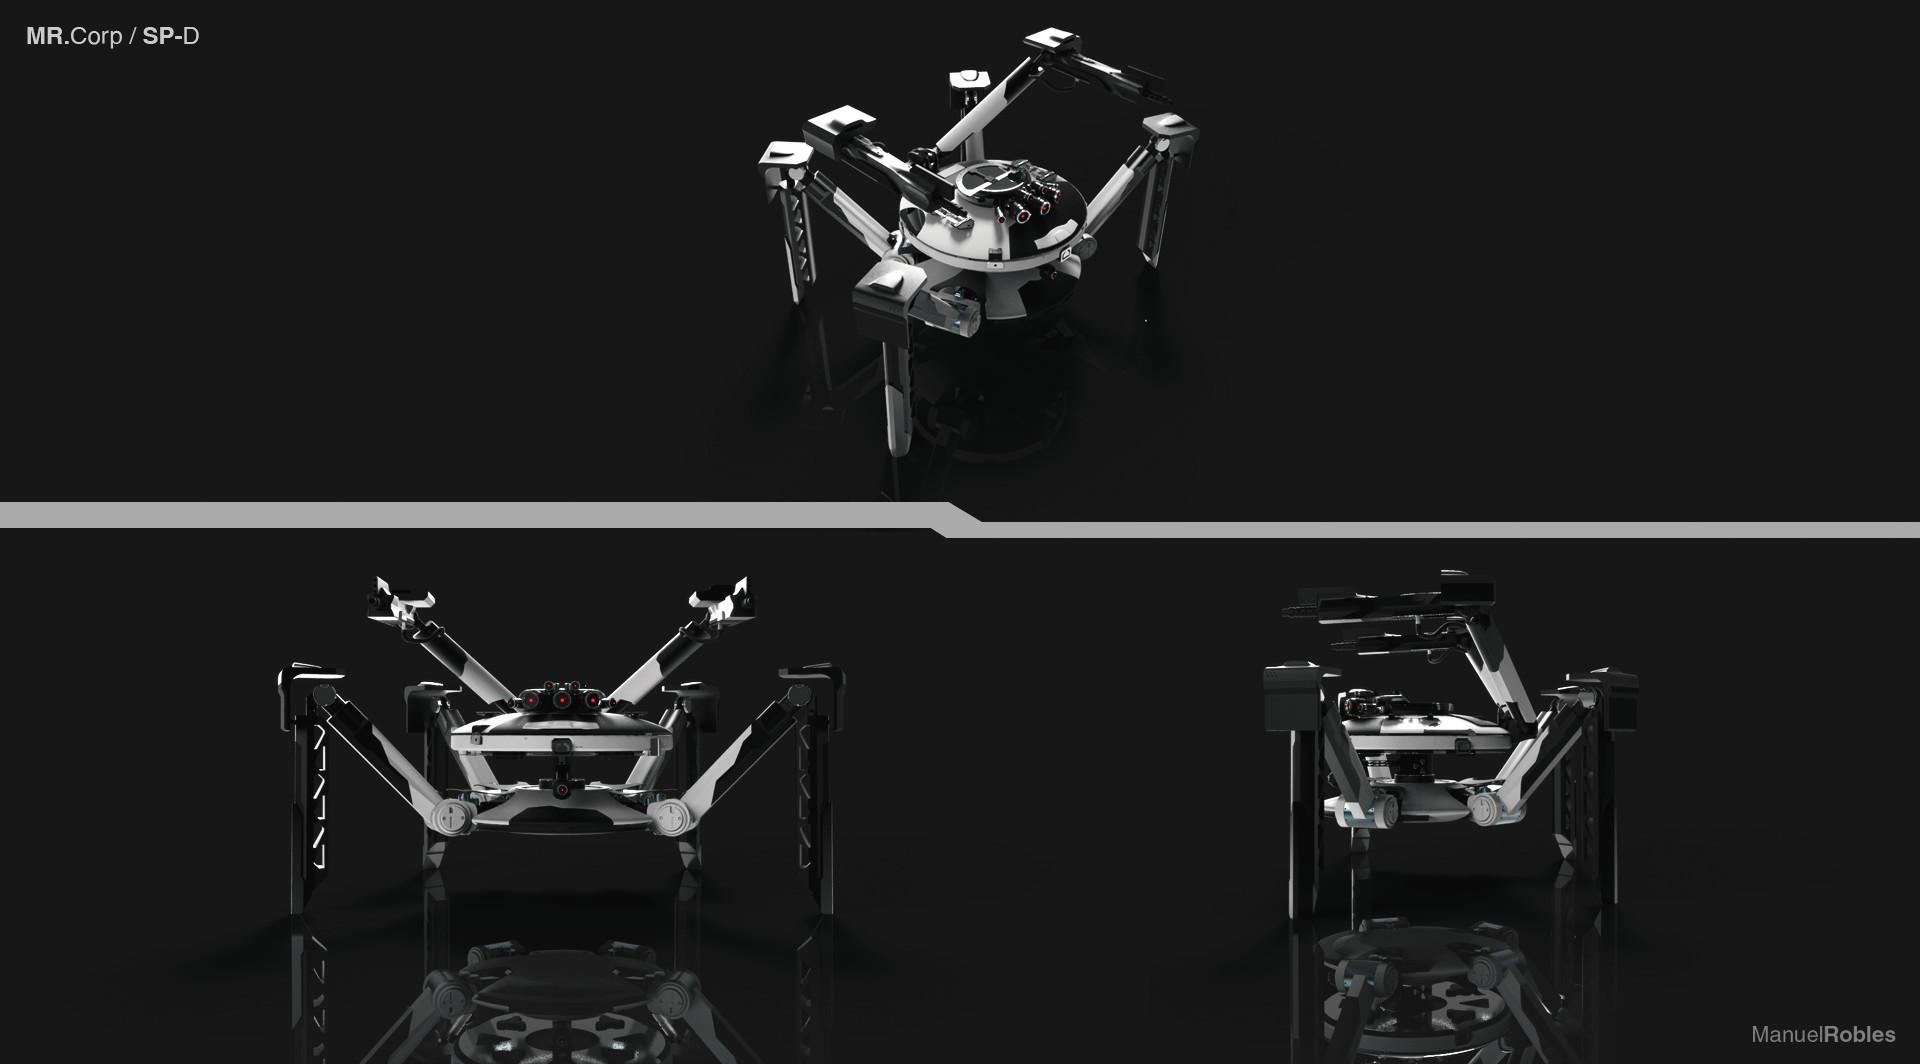 Manuel robles spider robotdron 02 viewset 60